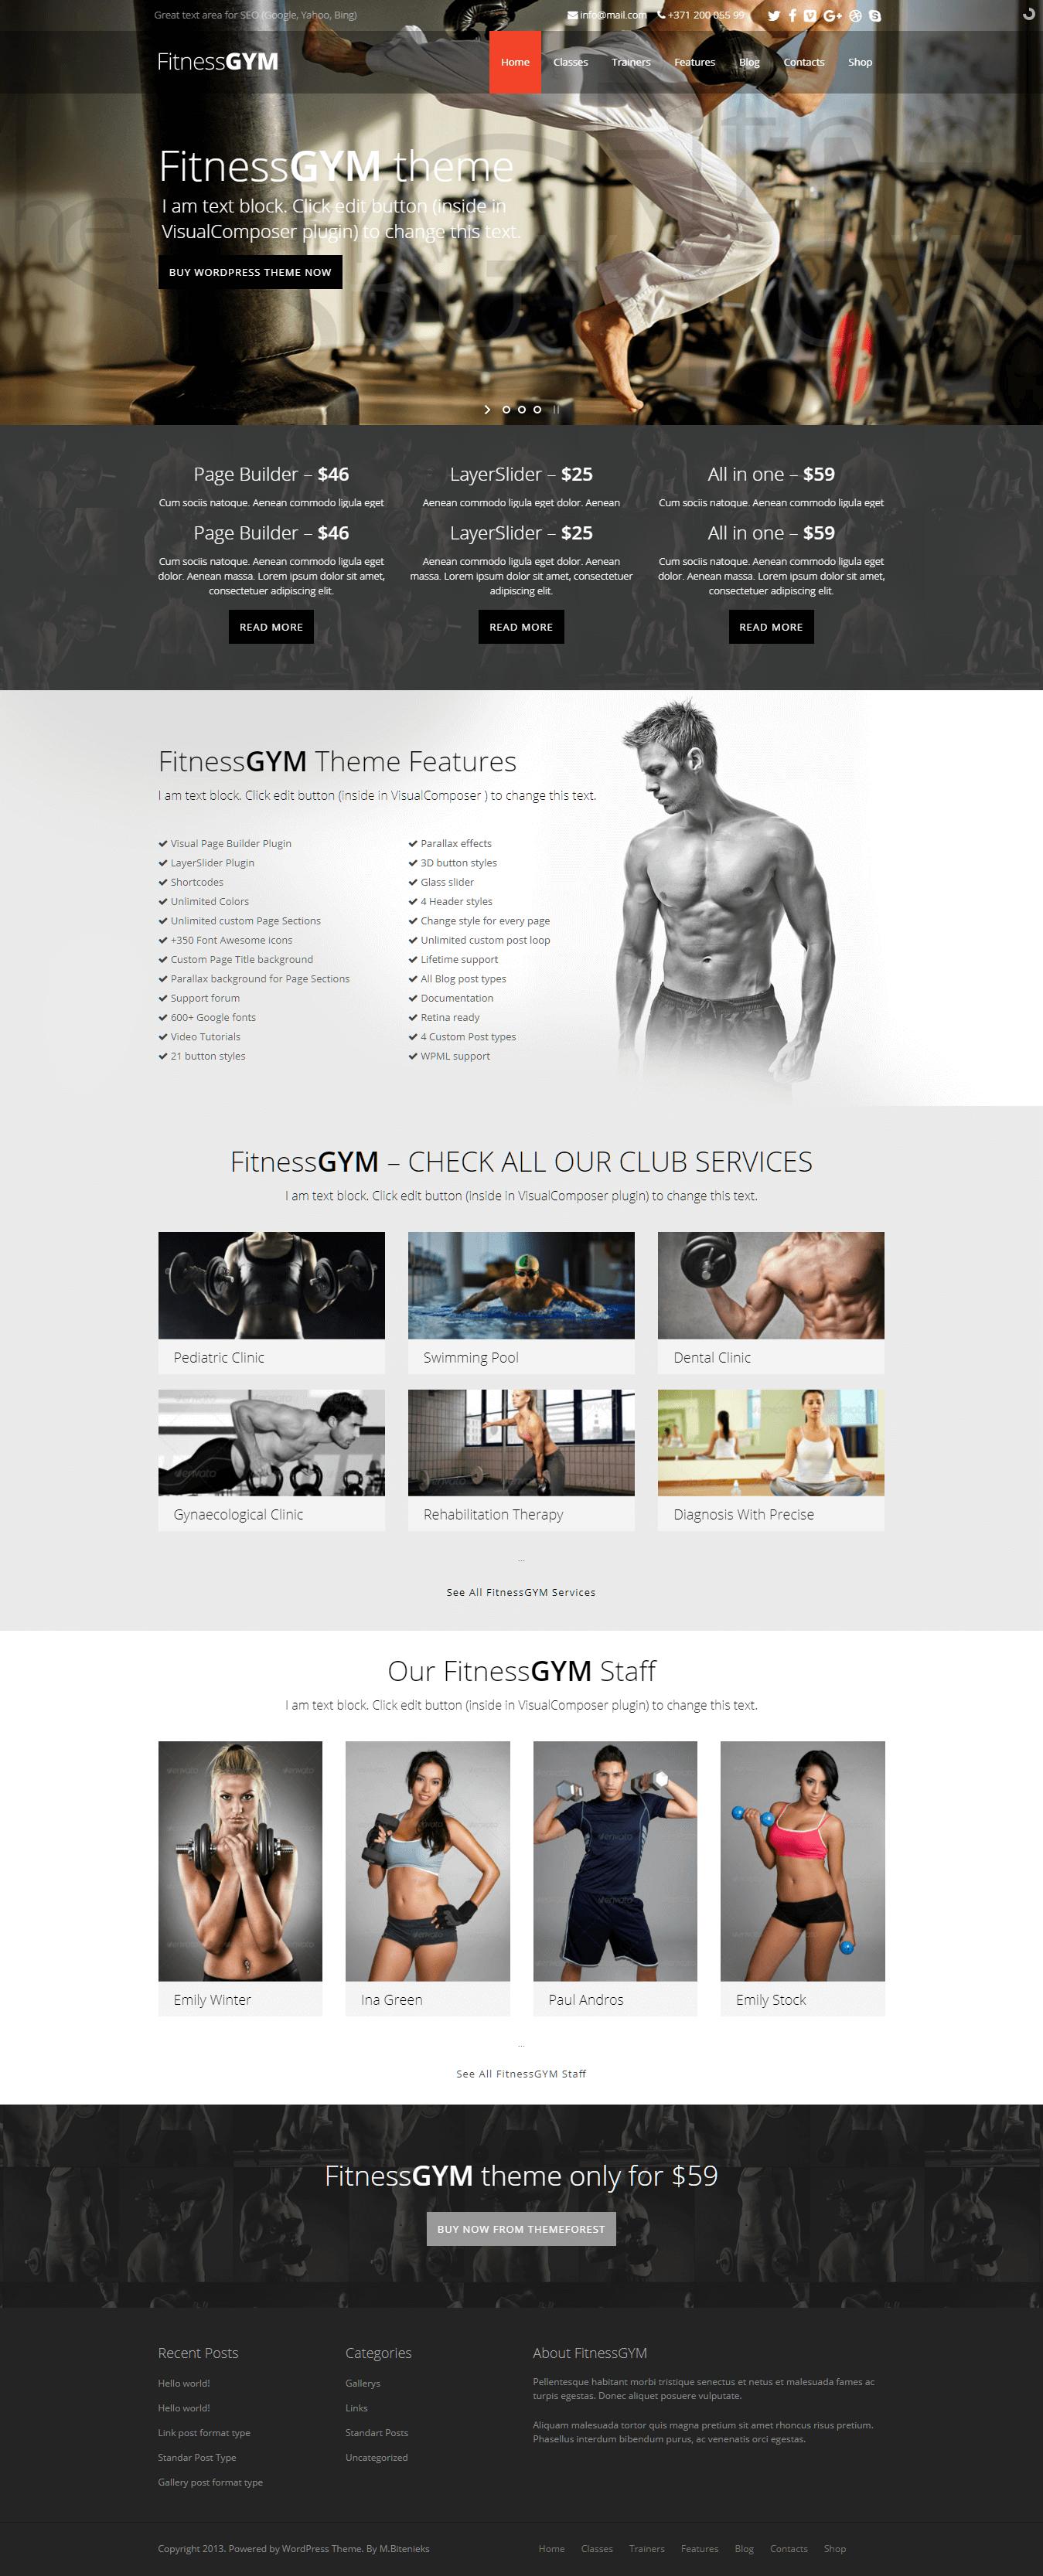 fitnessgym best premium sports wordpress theme - 10+ Best Premium Sports WordPress Themes